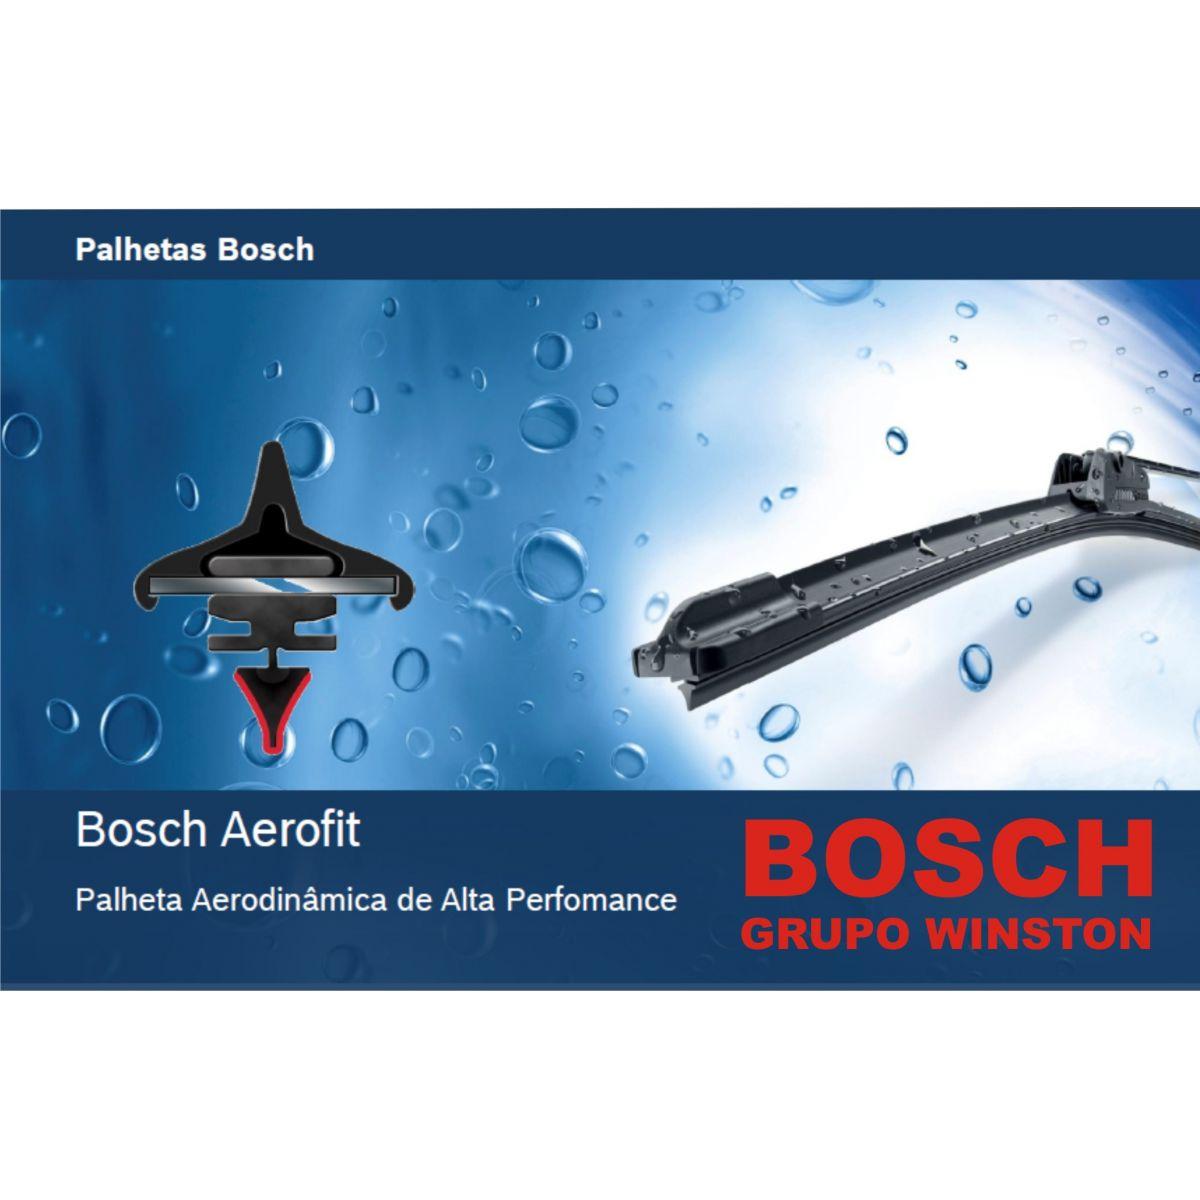 Palheta Bosch Aerofit Limpador de para brisa Bosch MITSUBISHI Eclipse L 200 Sport / Outdoor / Savana Pajero Sport